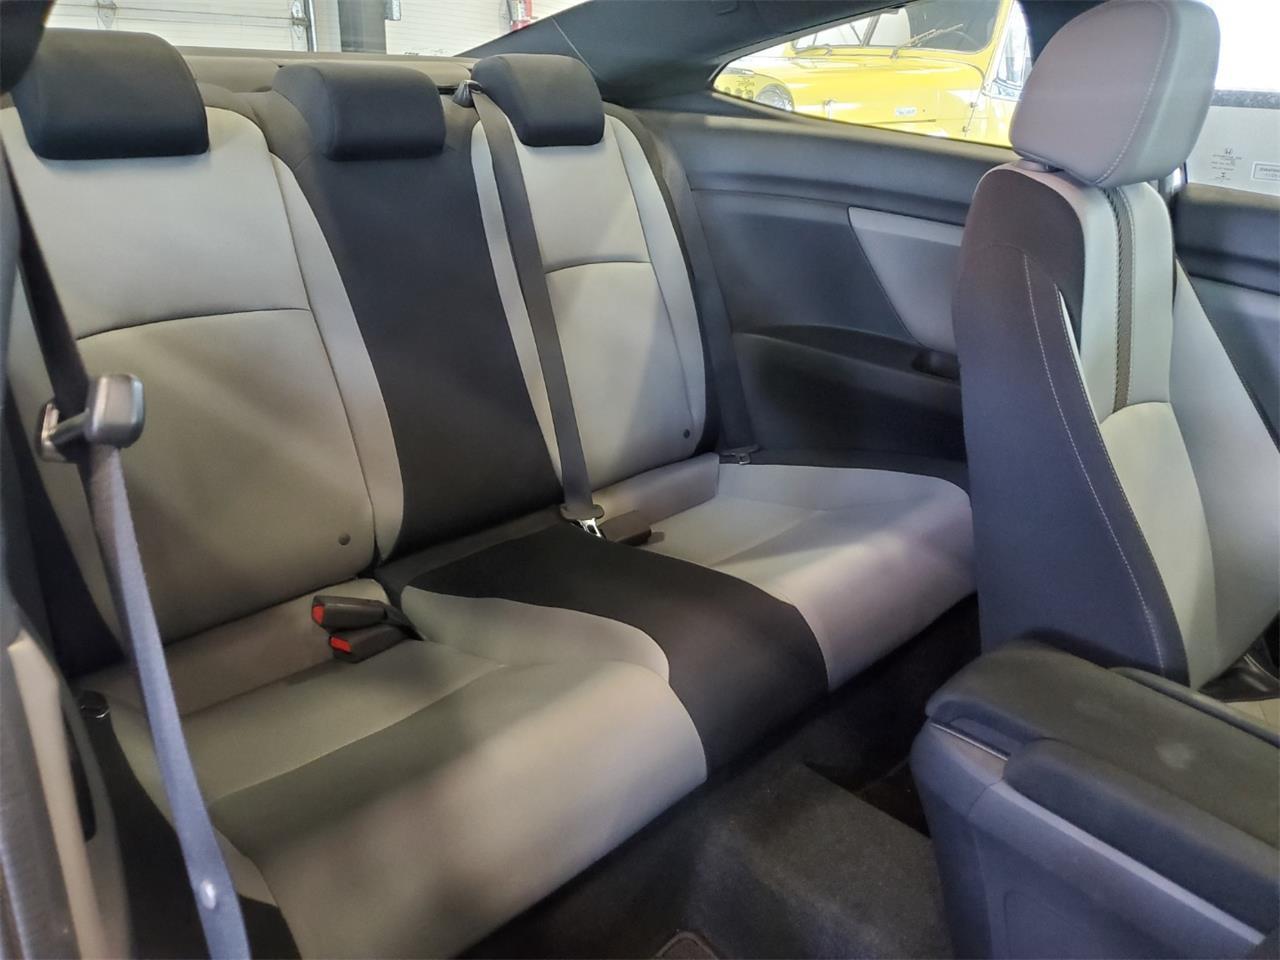 2016 Honda Civic (CC-1412925) for sale in Bend, Oregon